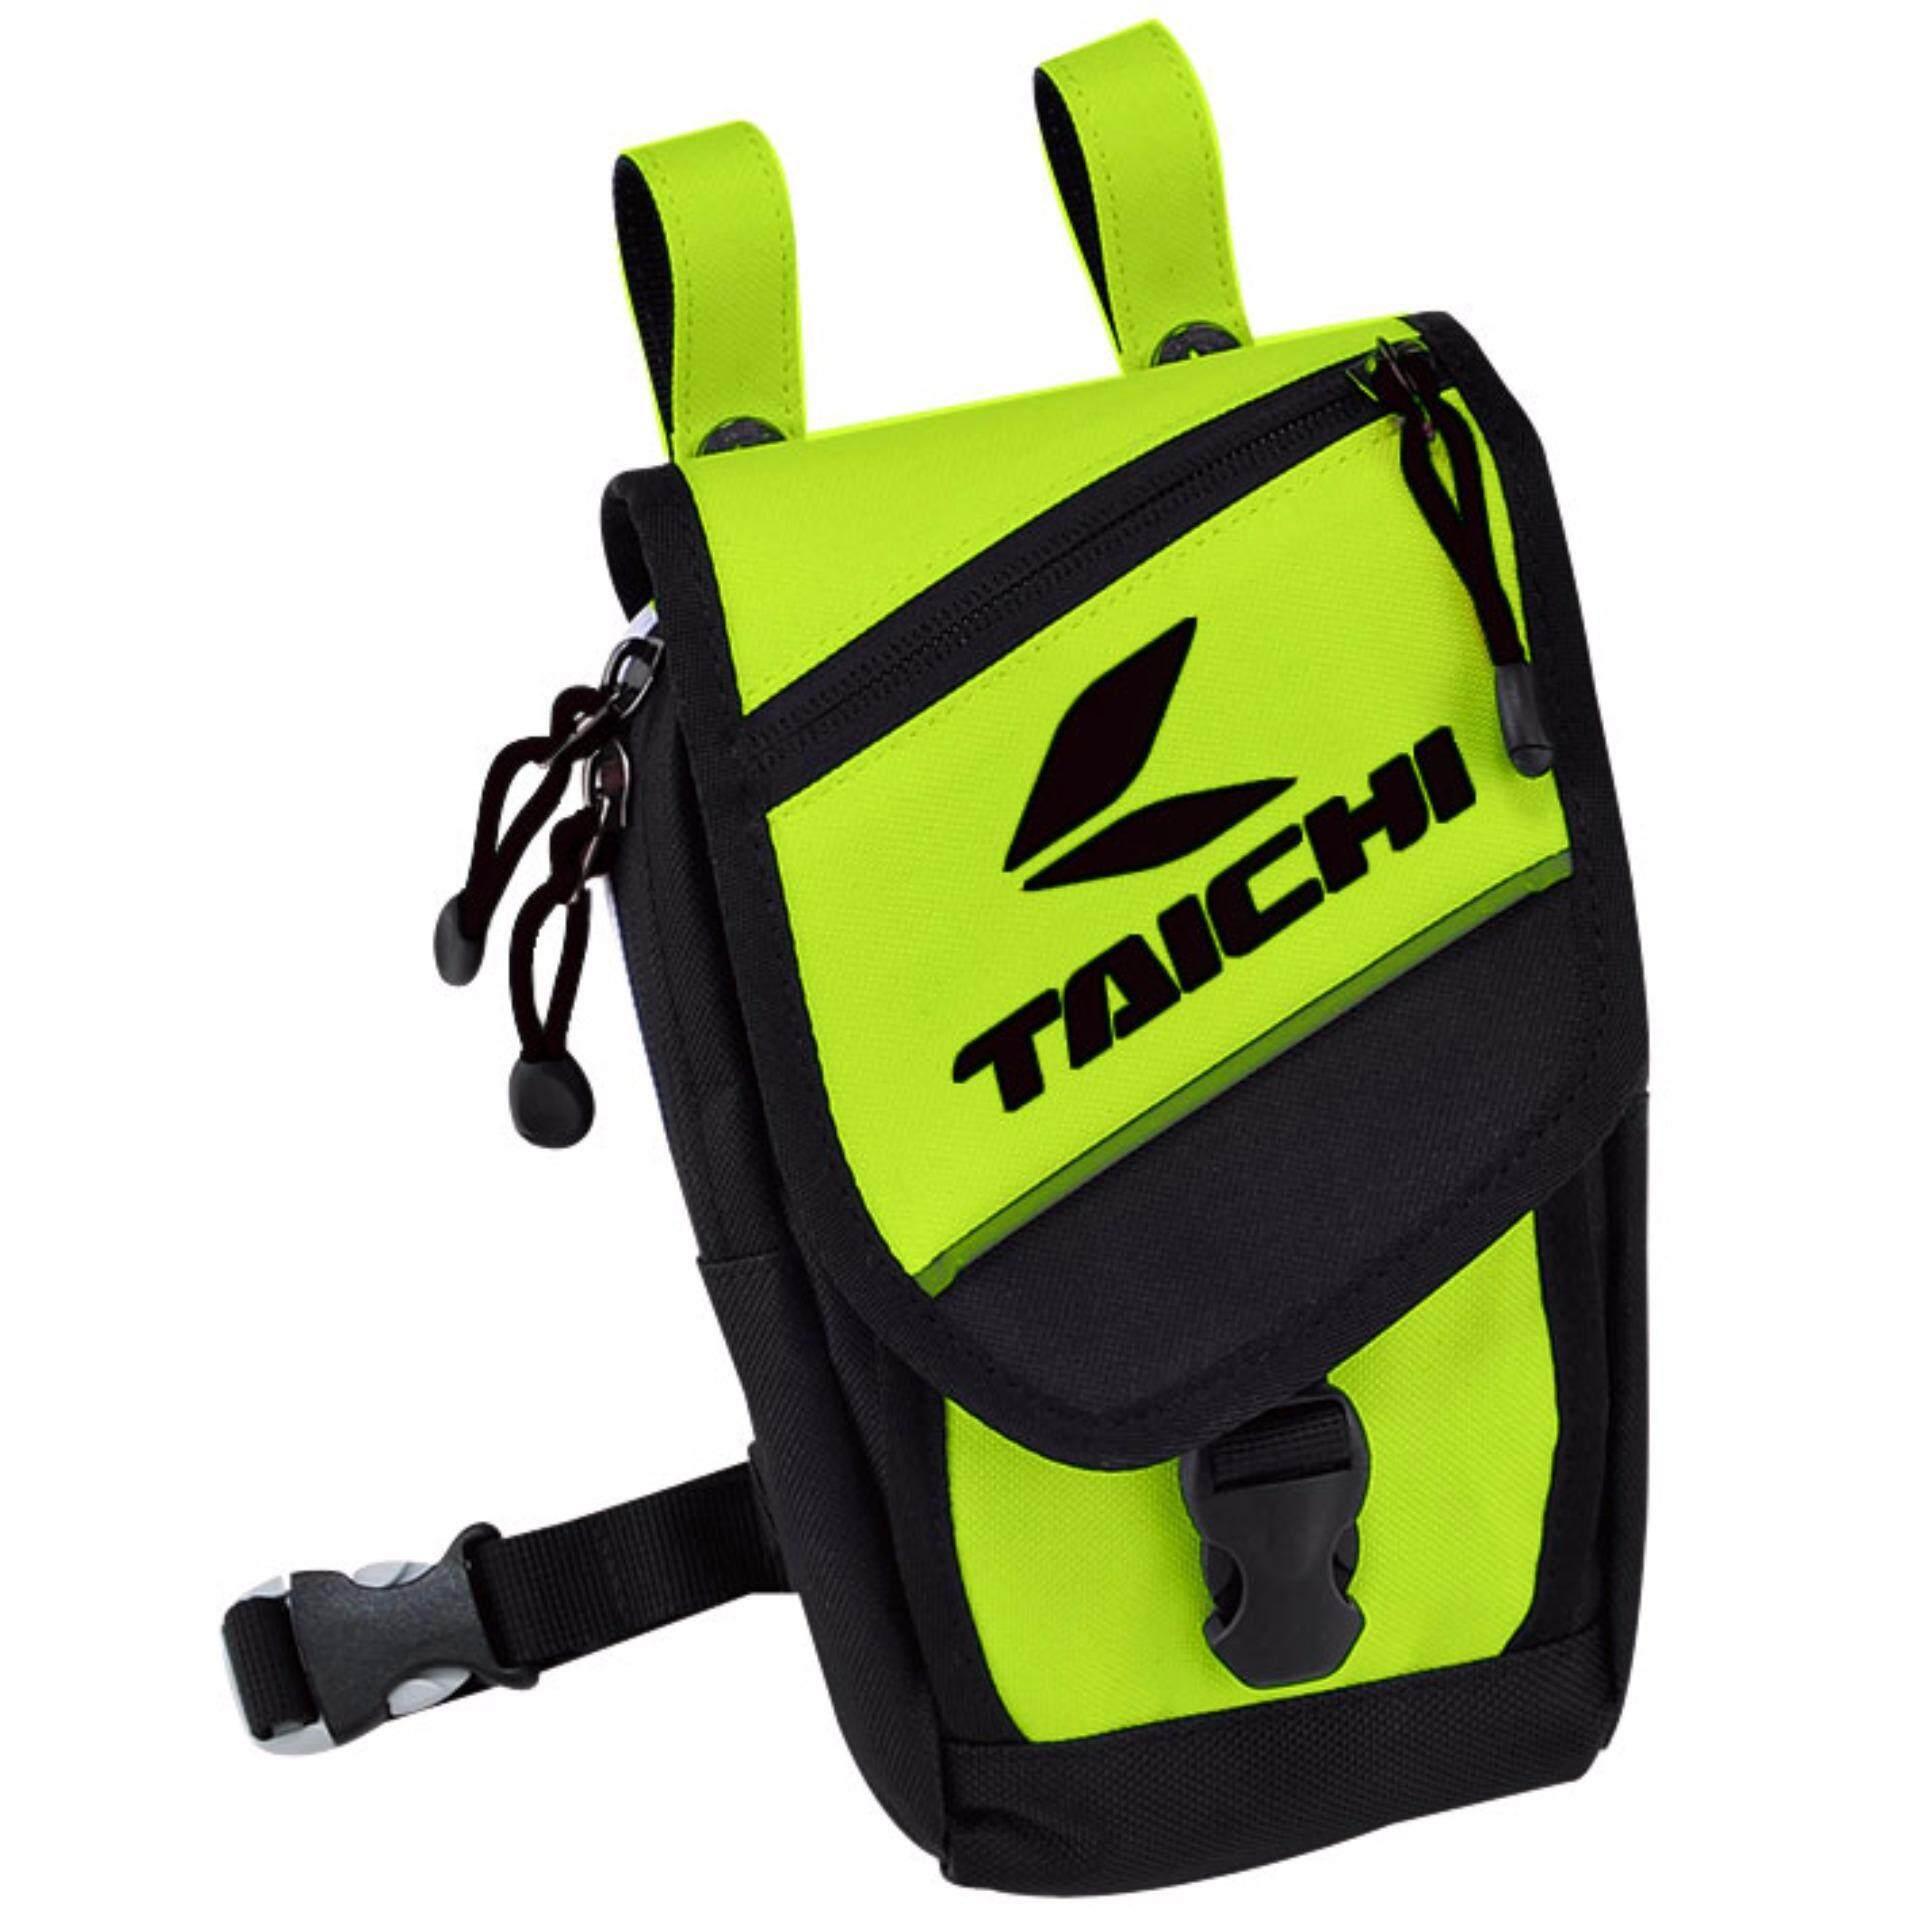 RS TAICHI RSB269 Belt Pouch Leg Bag Shoulder Bag Multifunctional Outdoor Sports Phone Bag